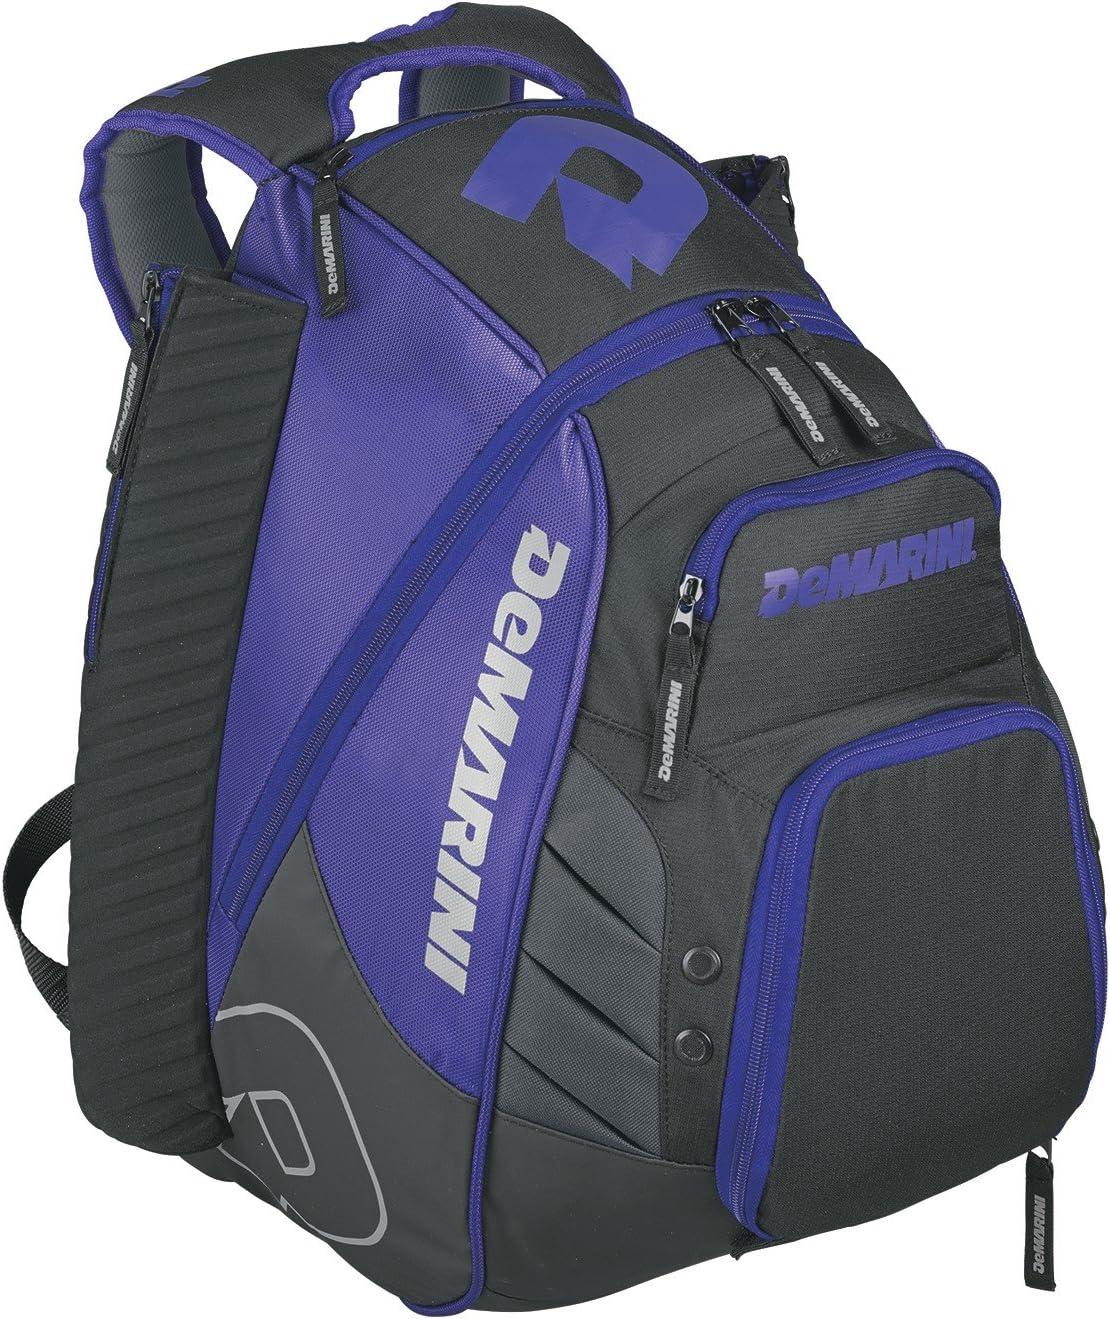 DeMarini Traditional Backpacks